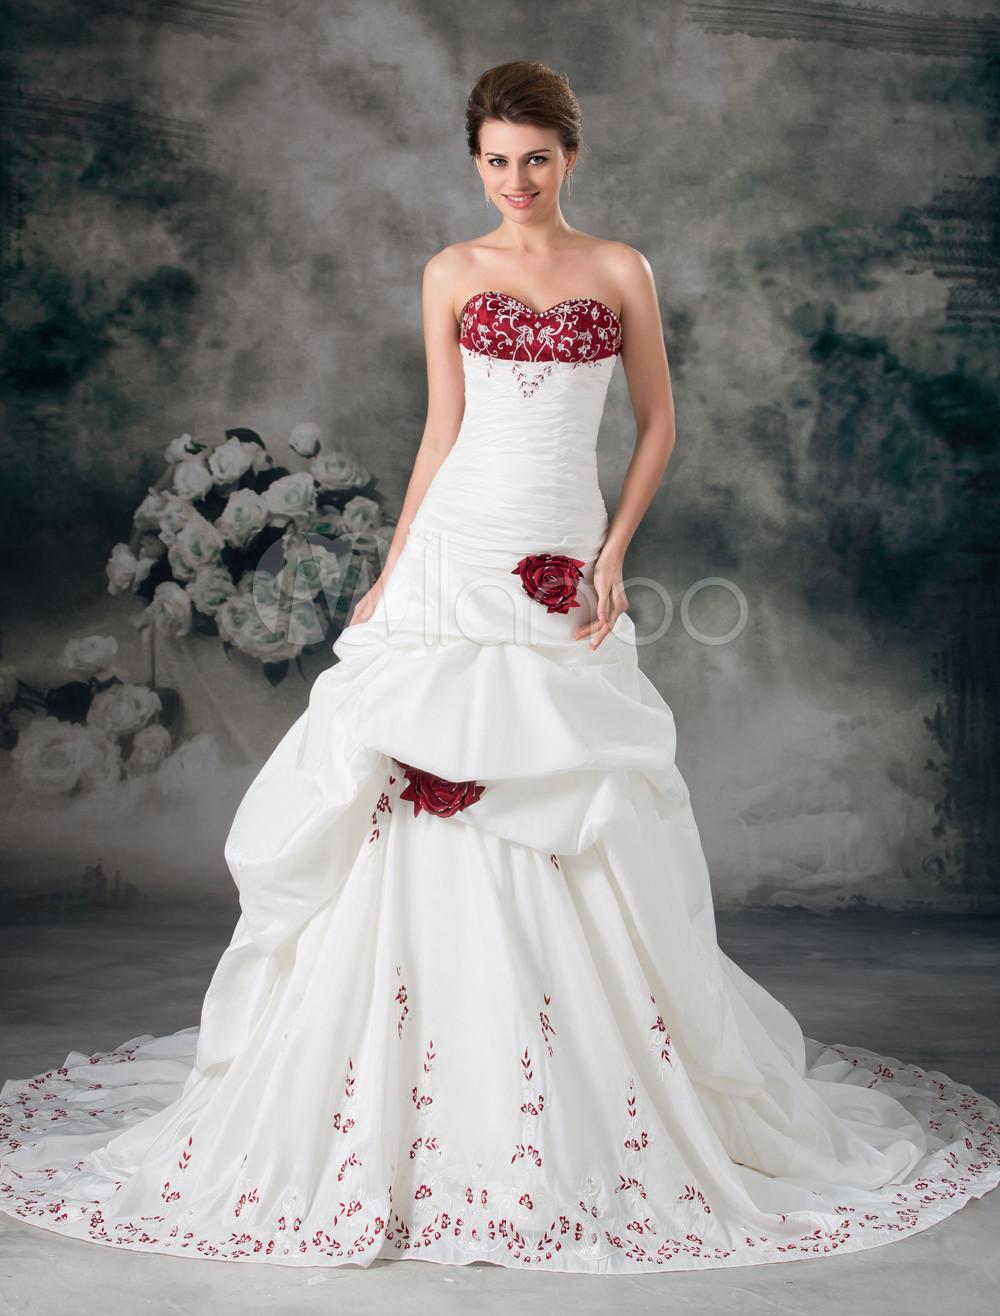 White Ball Gown Sweetheart Neck Embroidered Taffeta Wedding Dress photo